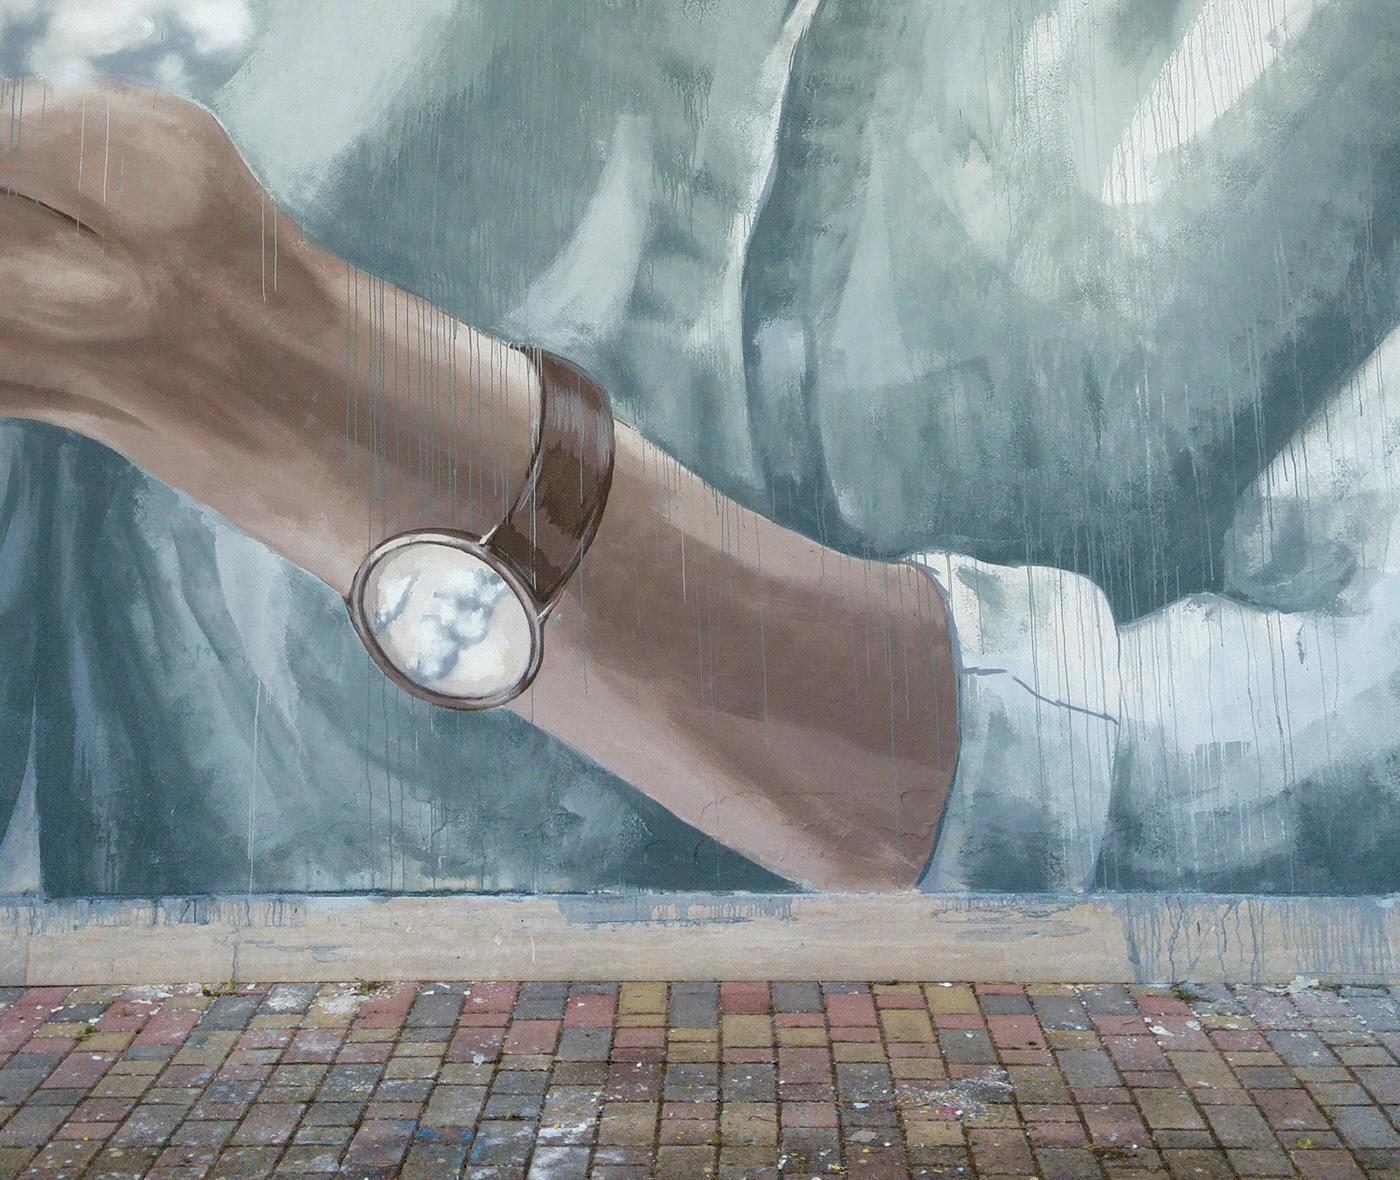 arte urbanio Bellas artes fine art Graffiti Mural mural art pintura pinturapainting streetart urban art